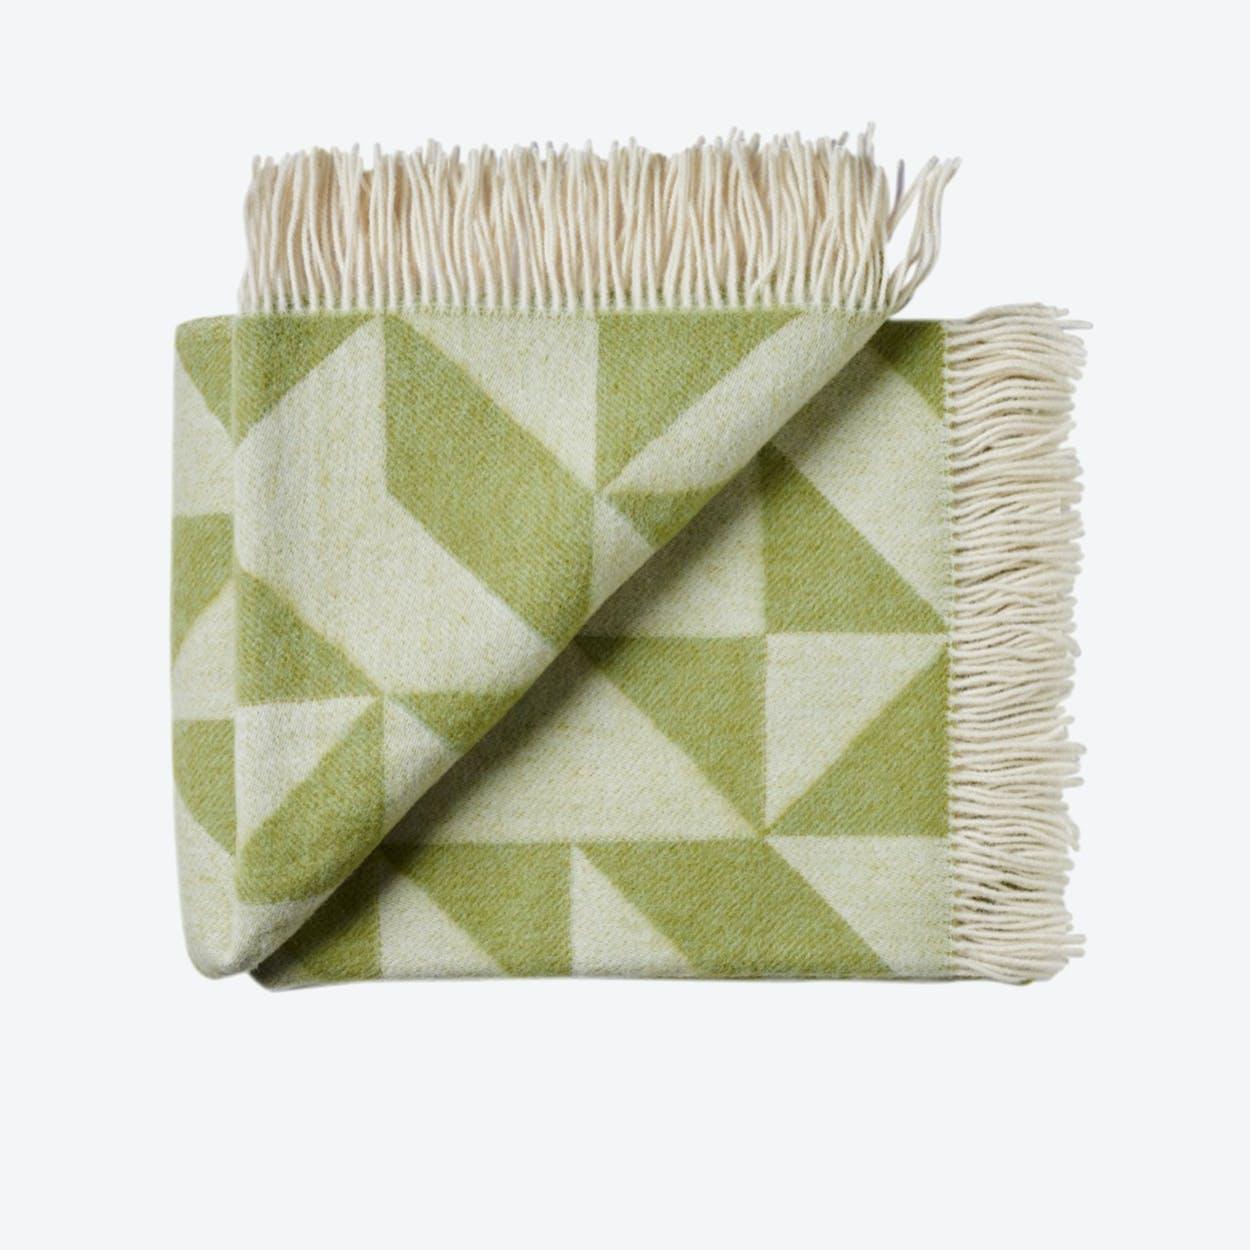 Twist A'Twill Wool Throw in Light-Green